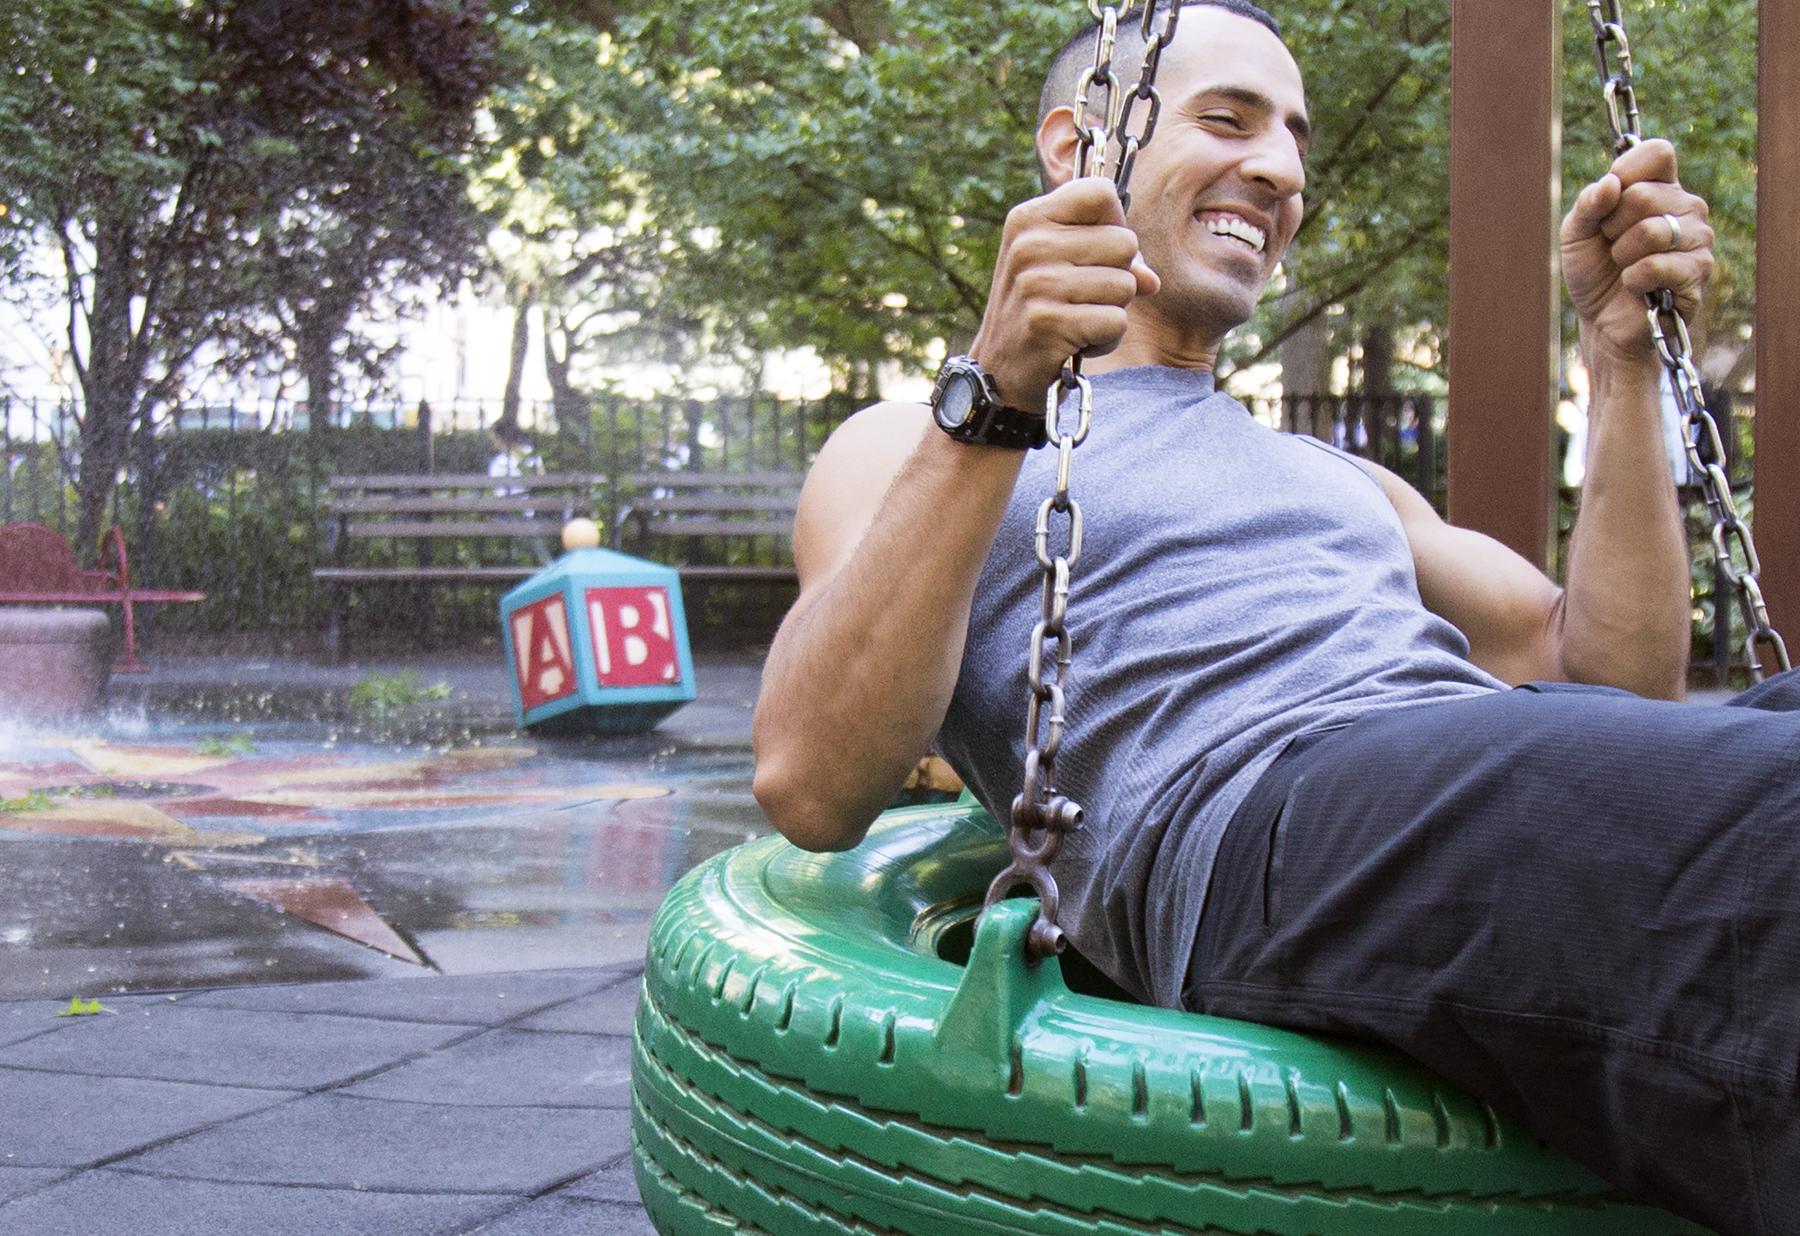 Jacks playground big ass show